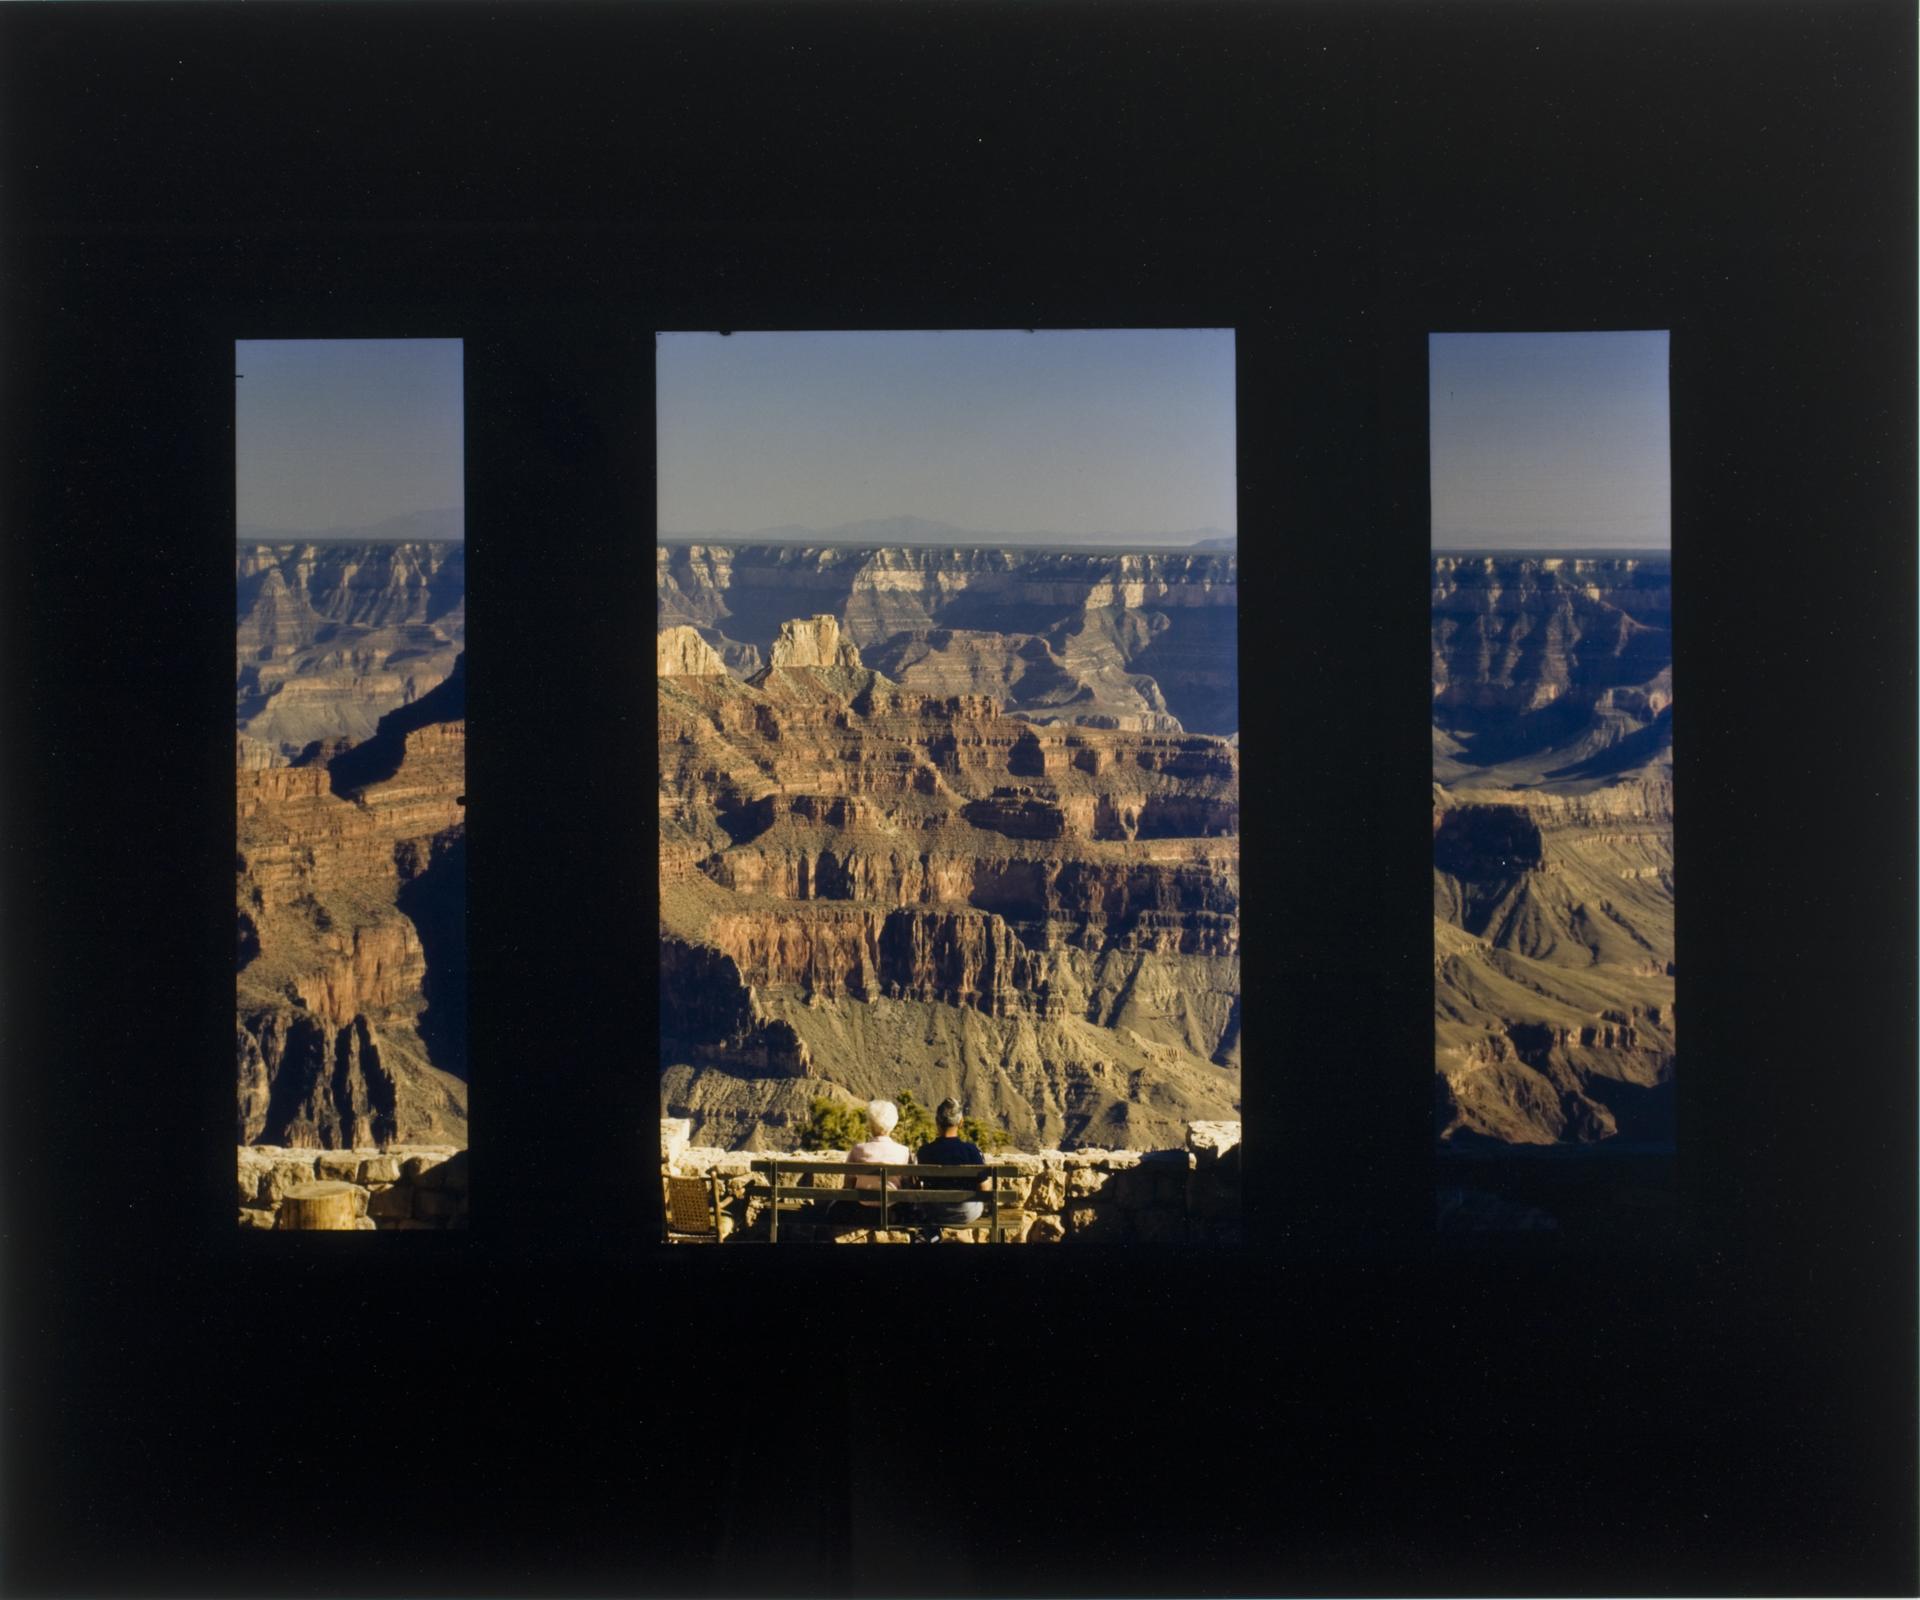 "John Pfahl (American, b. 1939). North Rim Highway, Grand Canyon, Arizona, June 1980. From the series ""Picture Windows"". Chromogenic development print, printed 1987. George Eastman Museum, gift of the photographer. © John Pfahl"